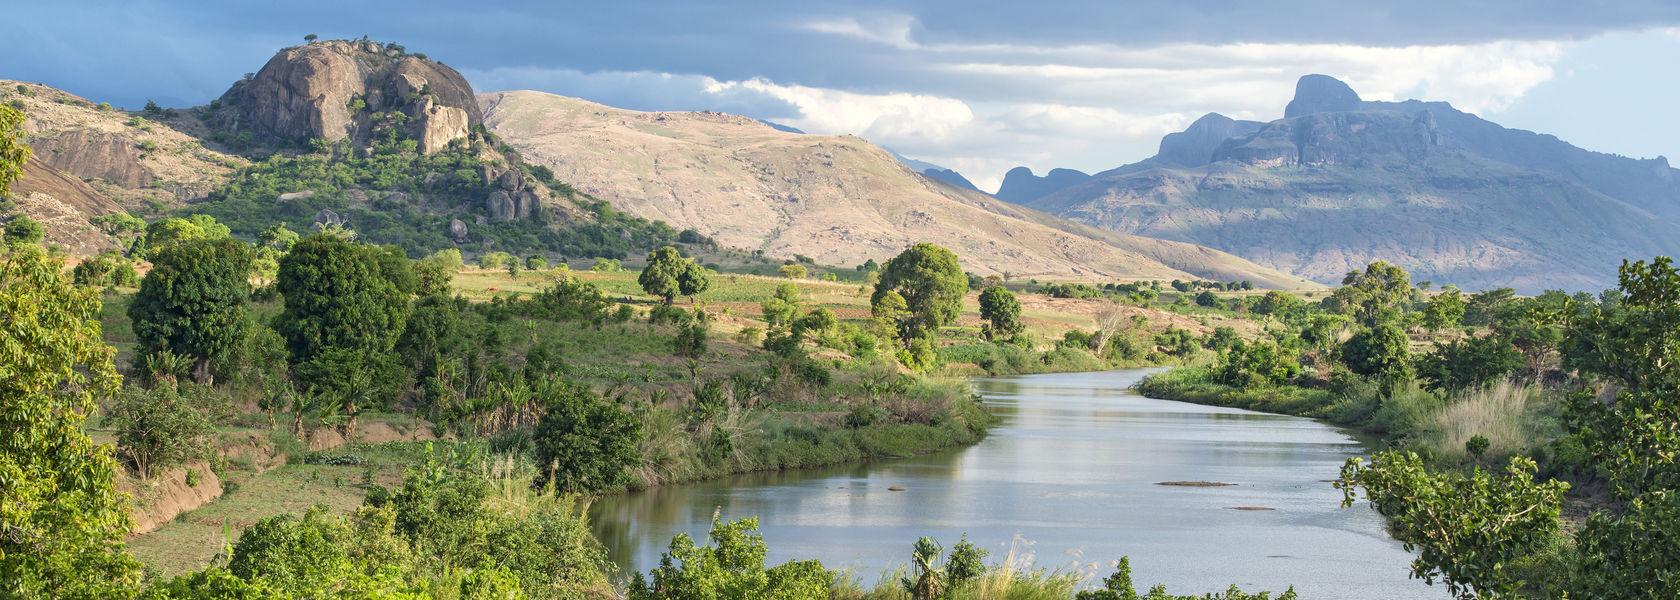 Madagascar reis - Andringitra gebergte